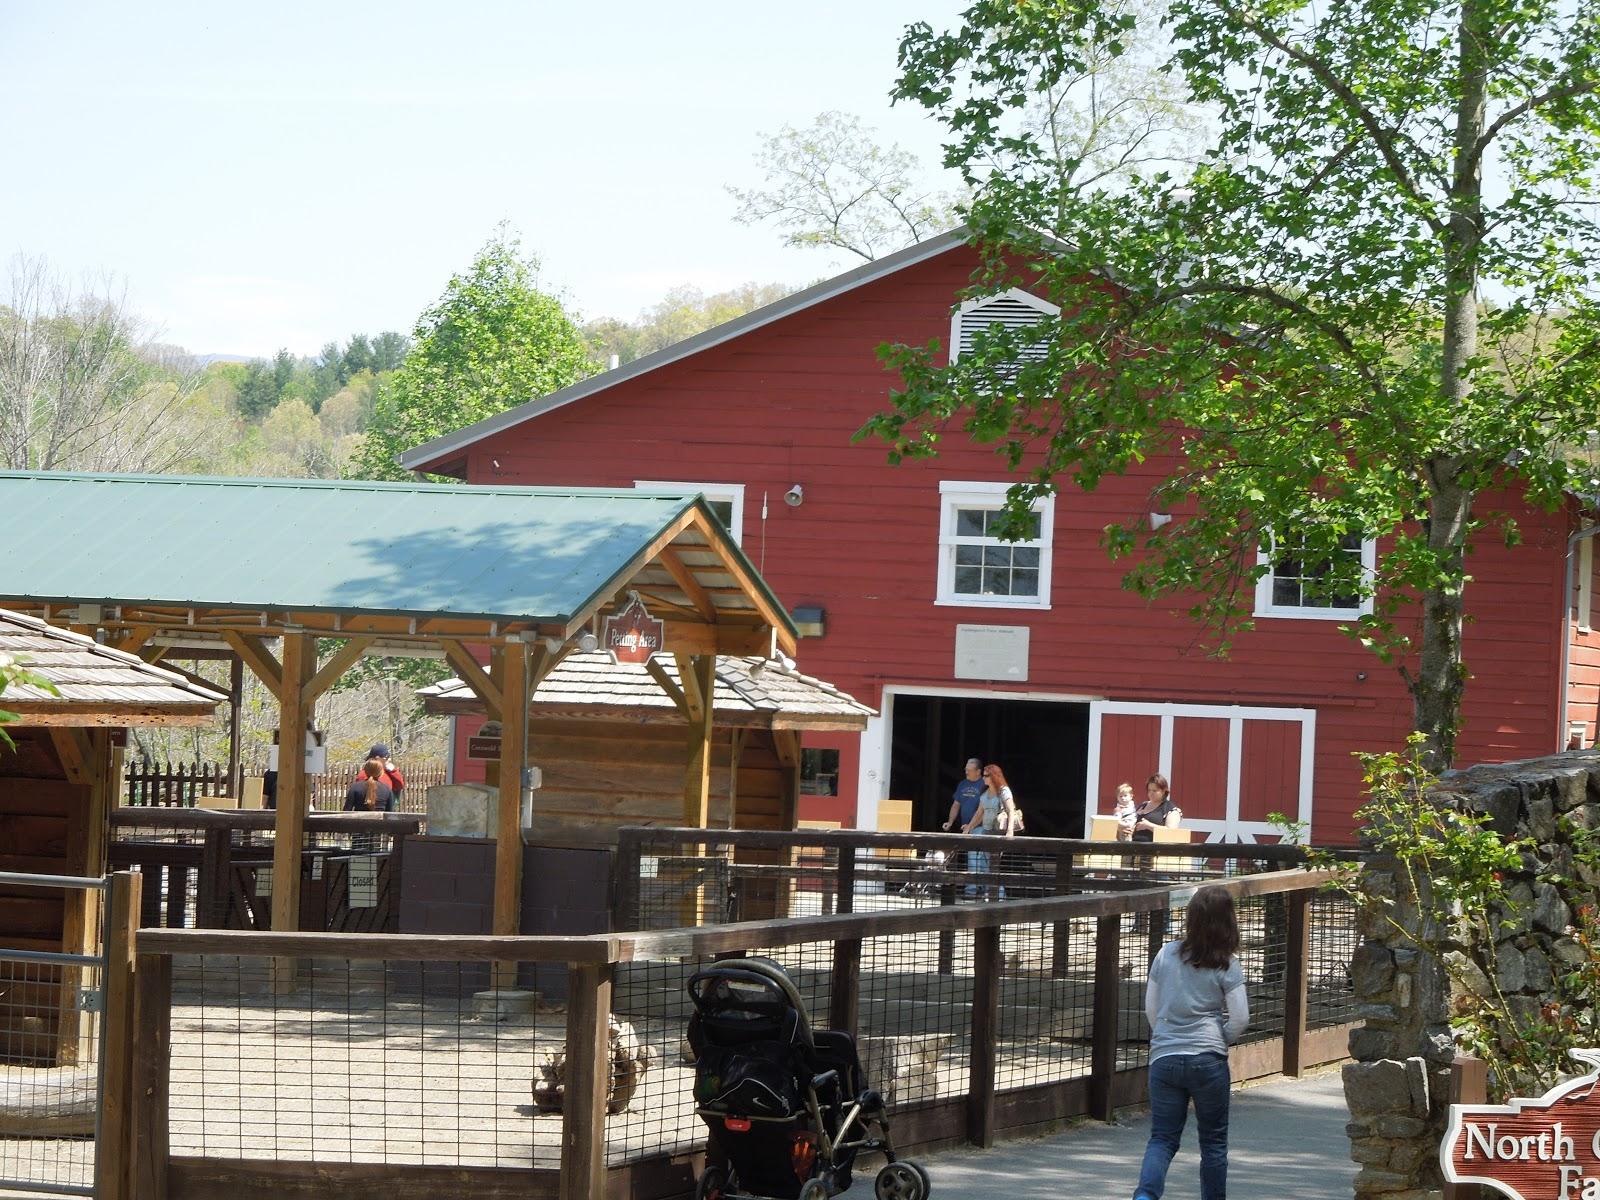 Western Nc Nature Center